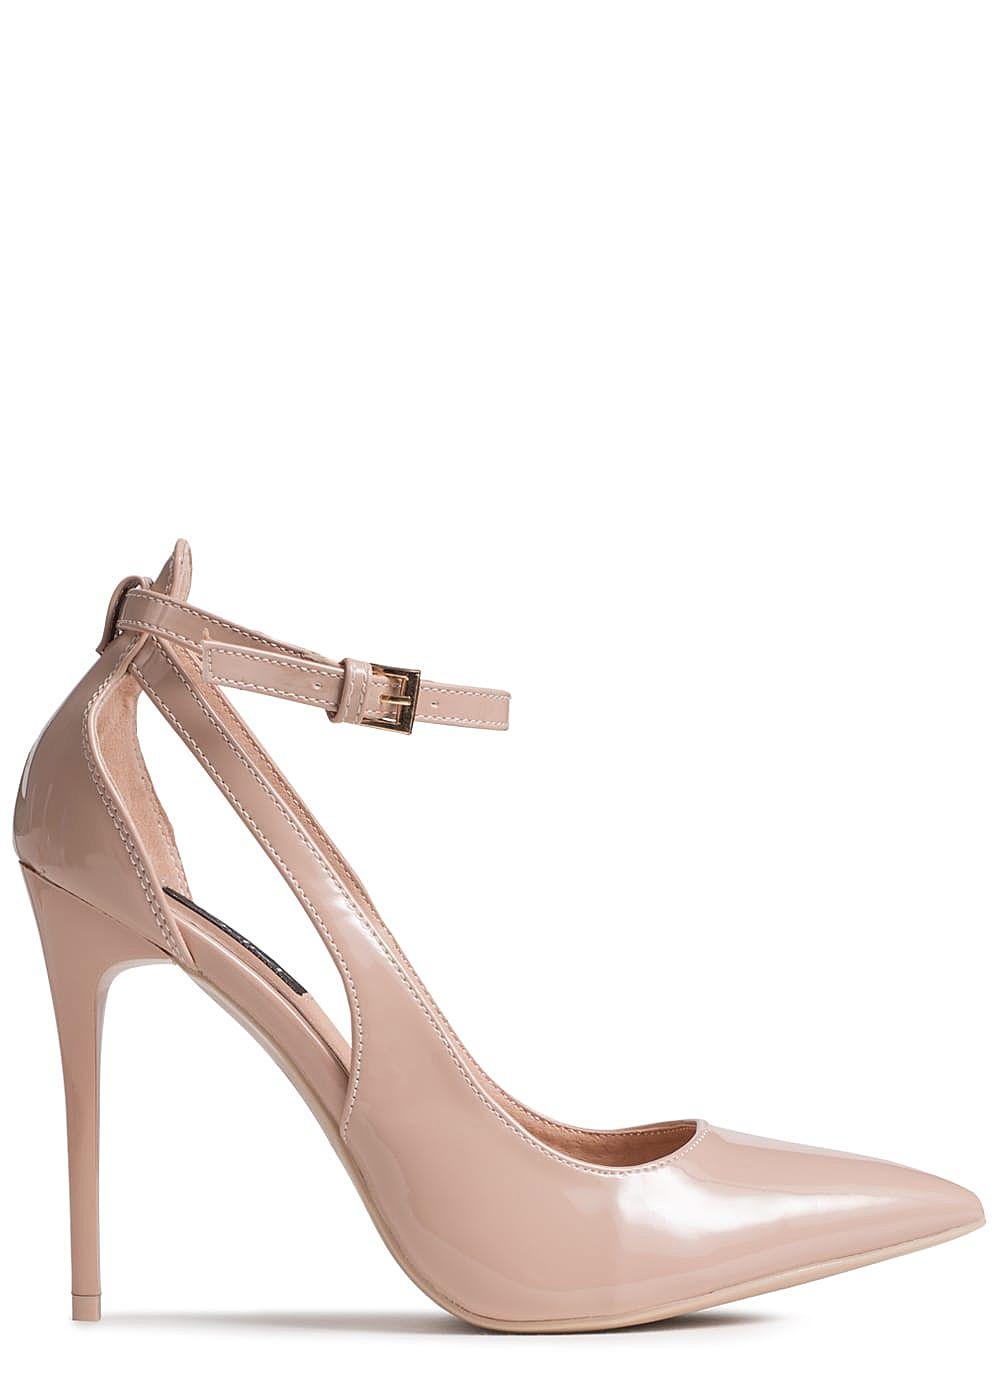 8aa51a7e31b297 Seventyseven Lifestyle Schuh Damen Pumps Absatz 11cm nude rosa ...